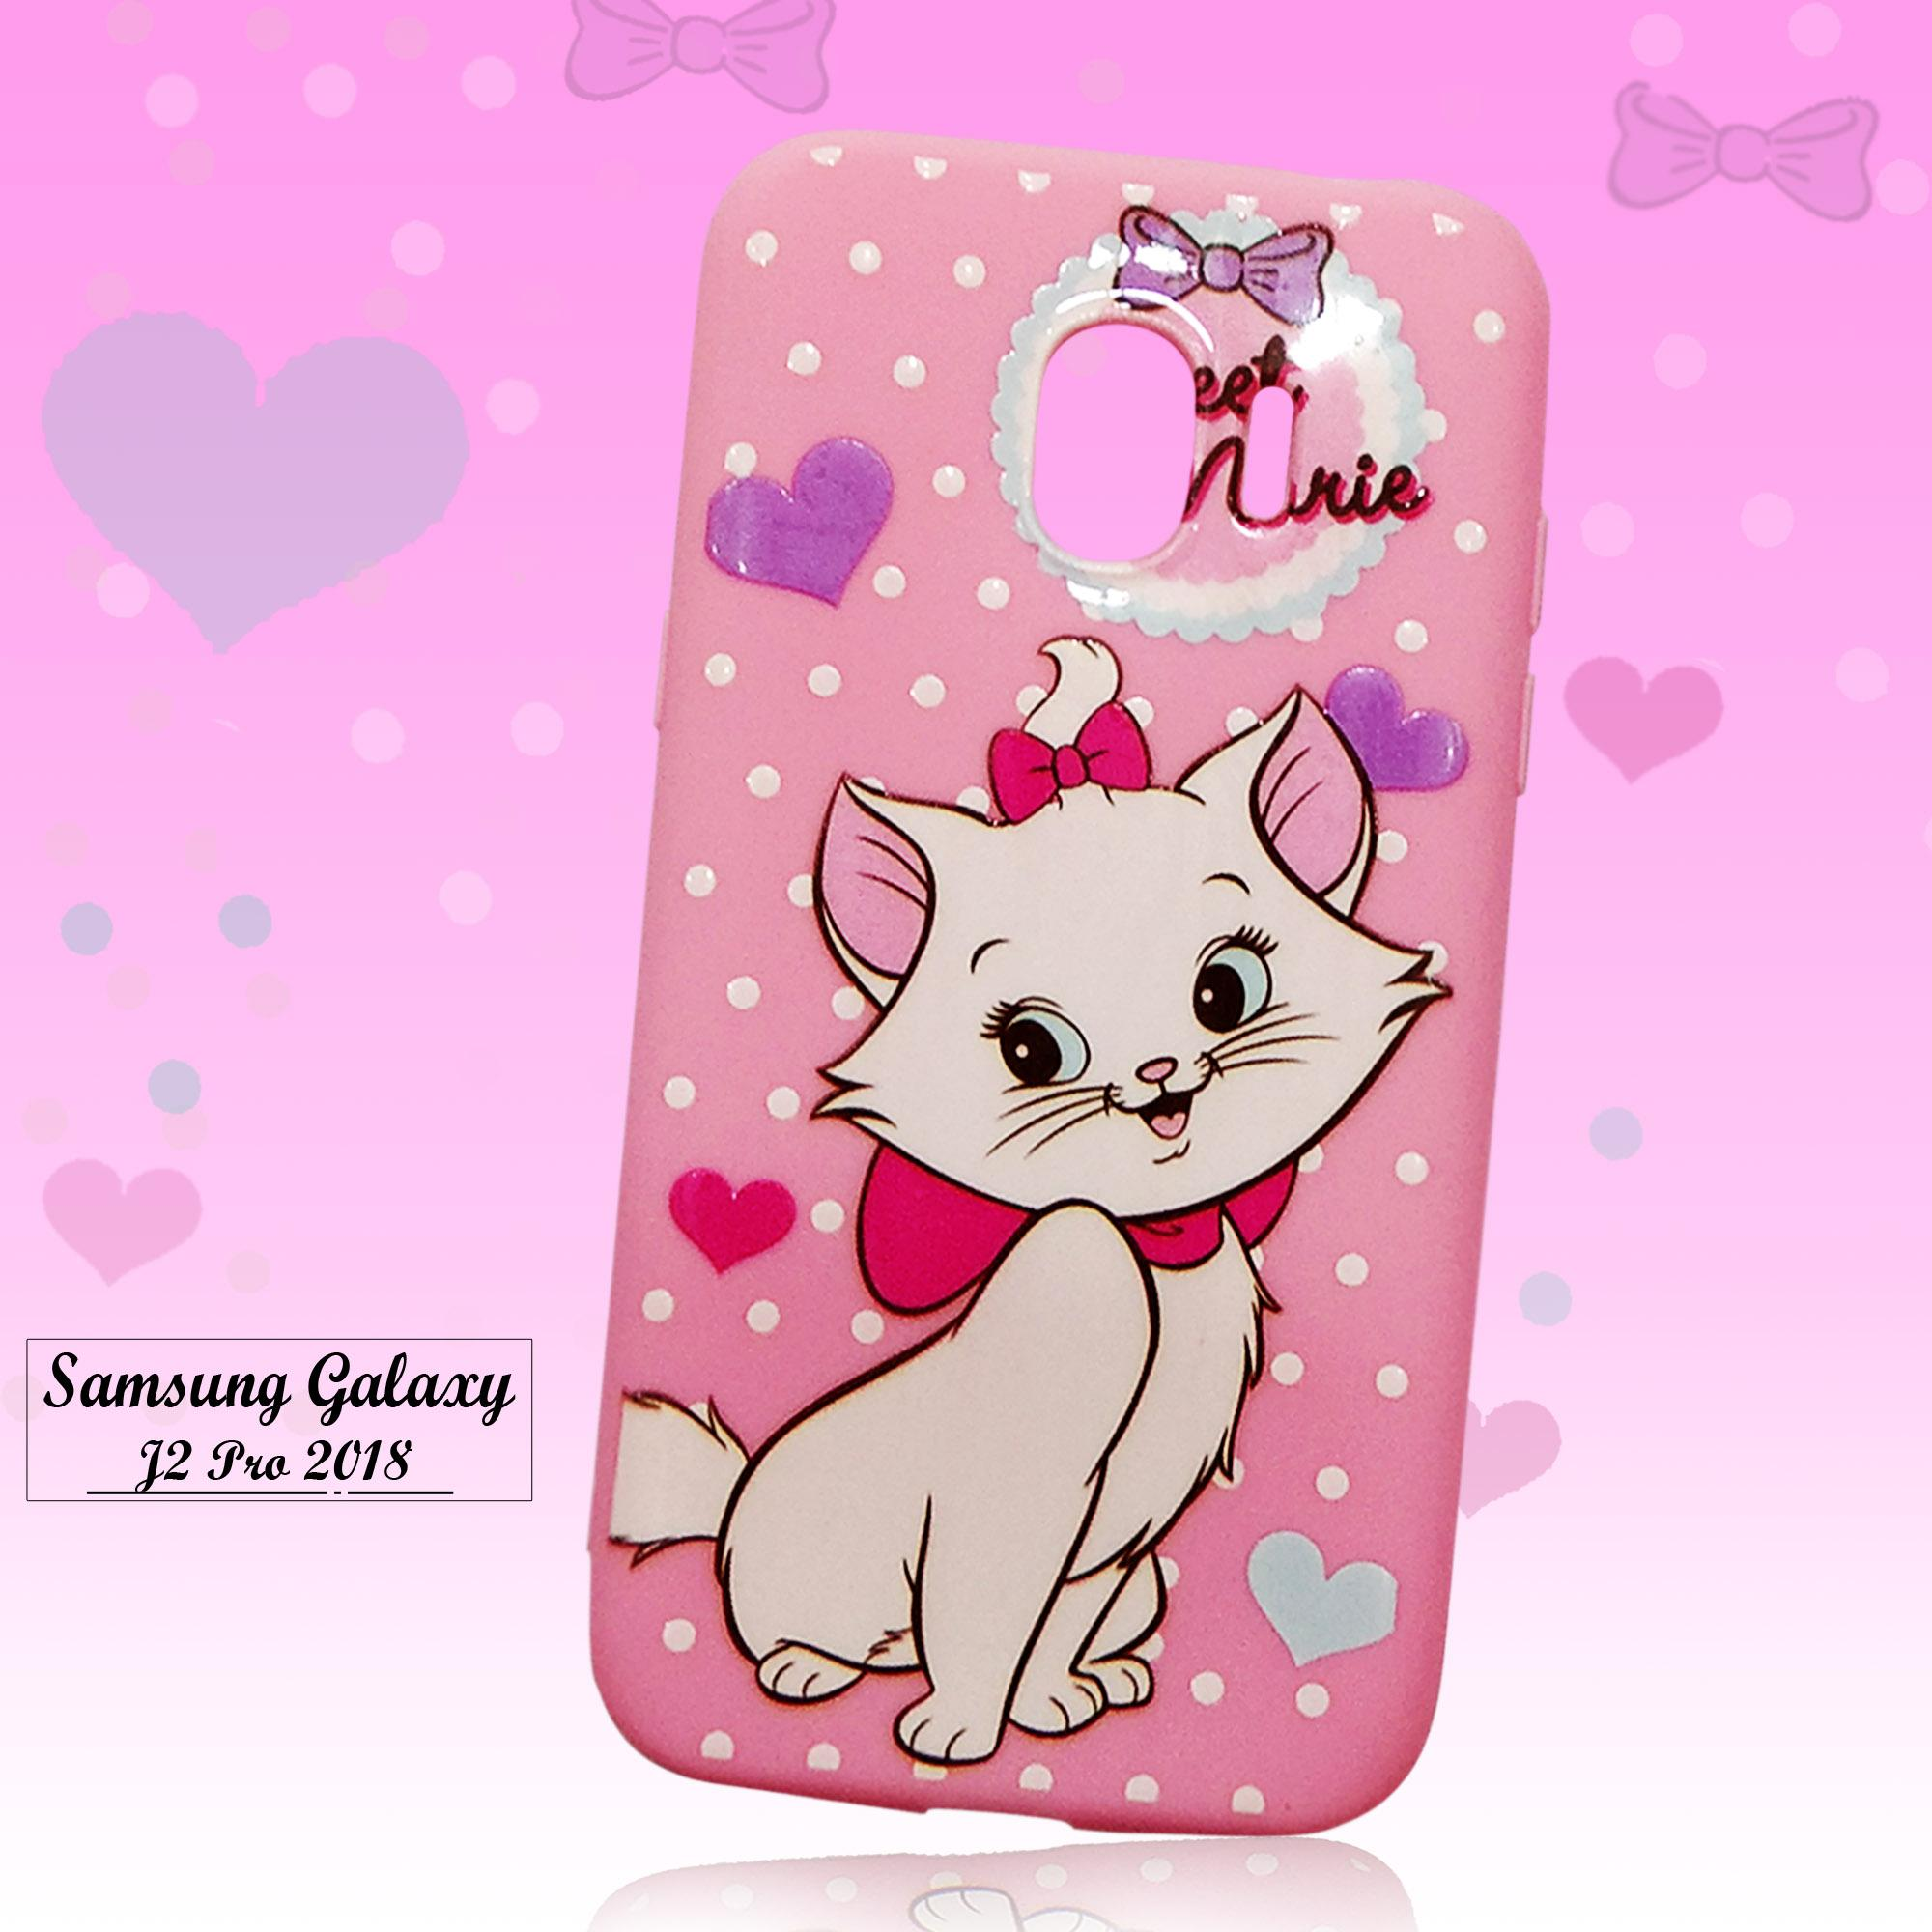 Fitur Softcase Cute Fashion Phone Case New Samsung Galaxy J2 Pro